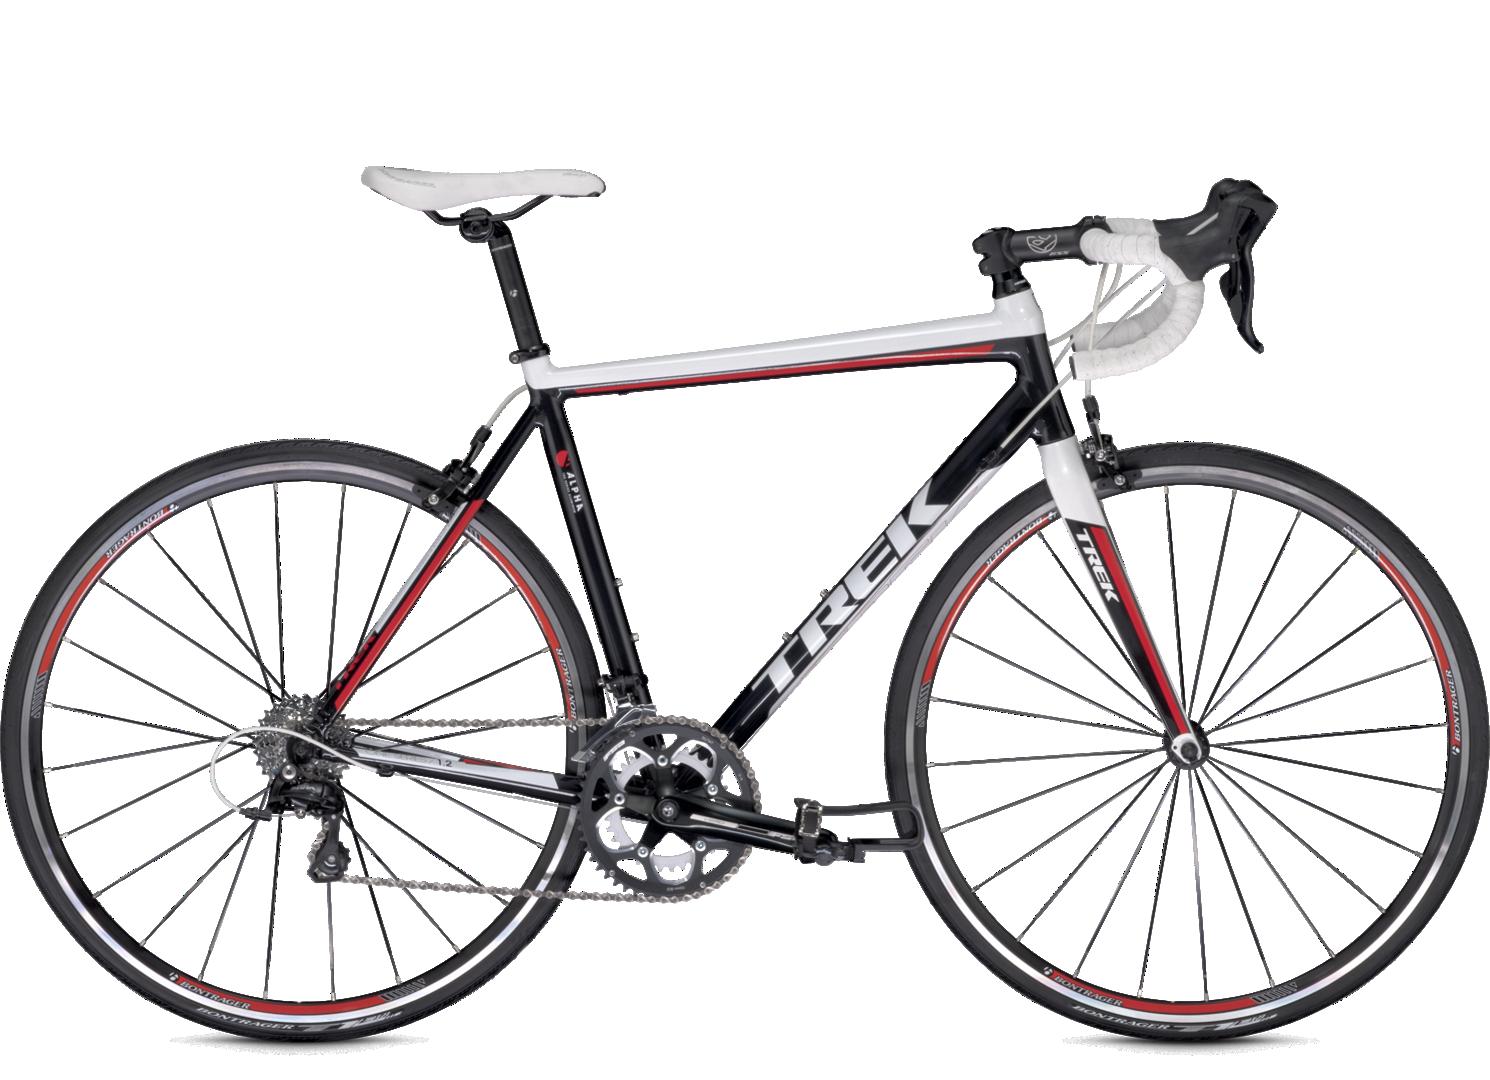 Bicycle PNG, bike photo